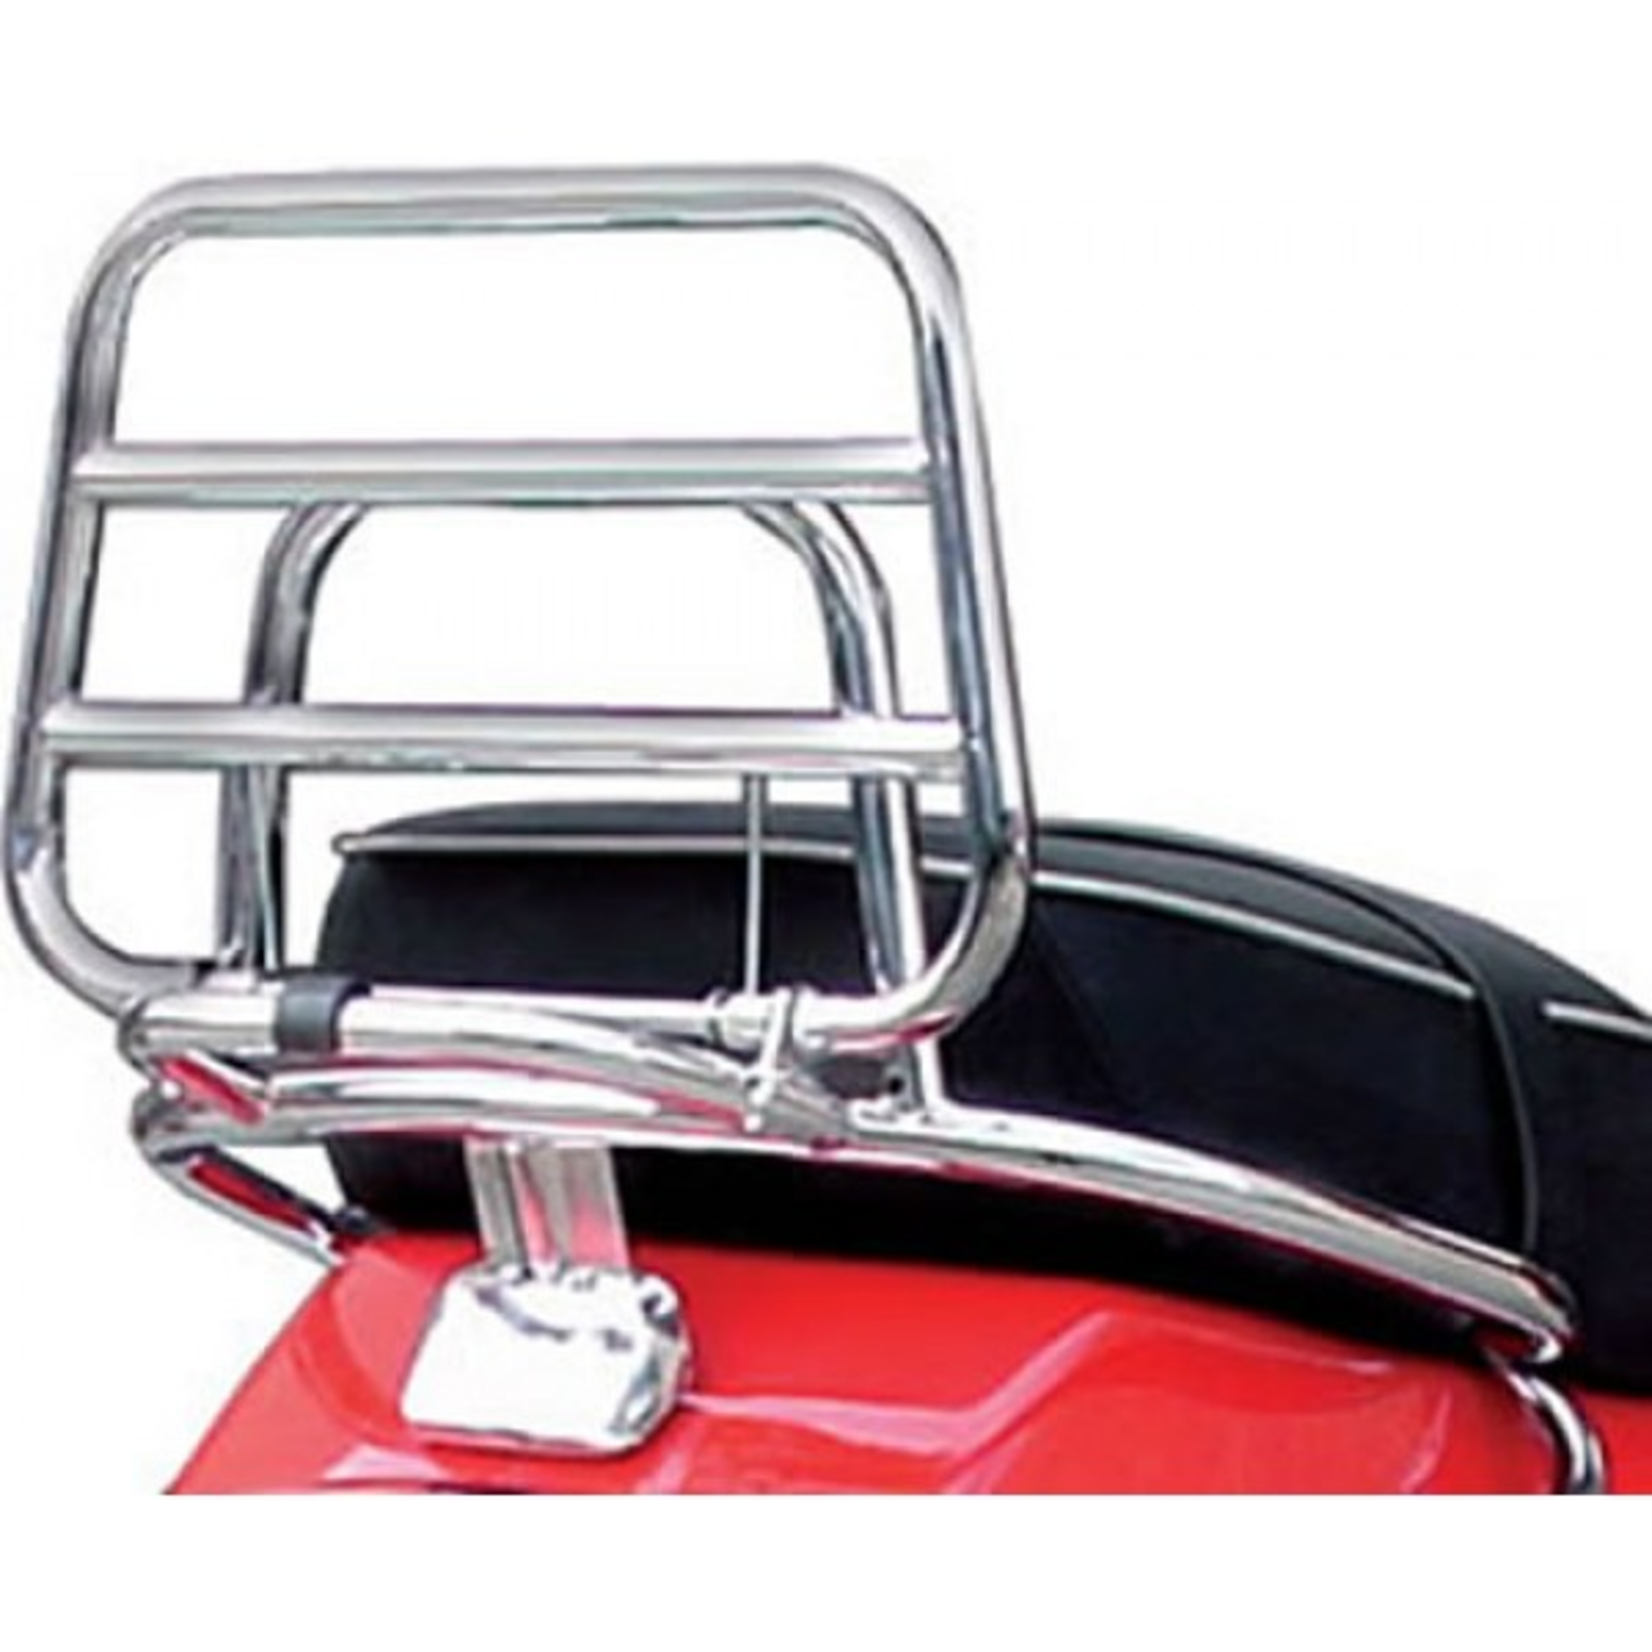 Accessories Rack, Vespa S/LX Rear Chrome W/Handle